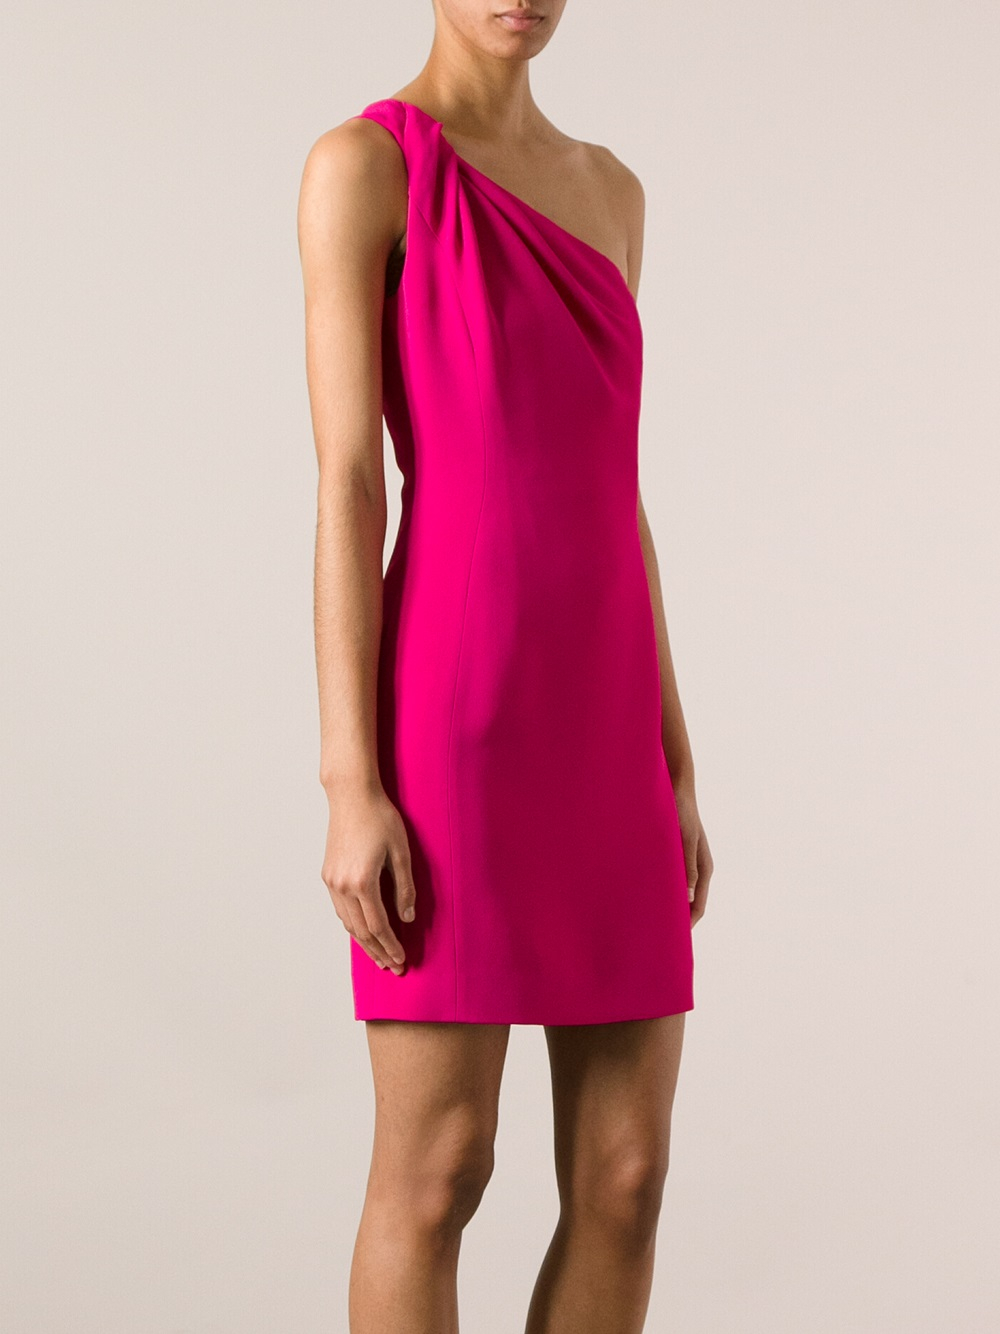 Saint laurent One Shoulder Dress in Pink | Lyst